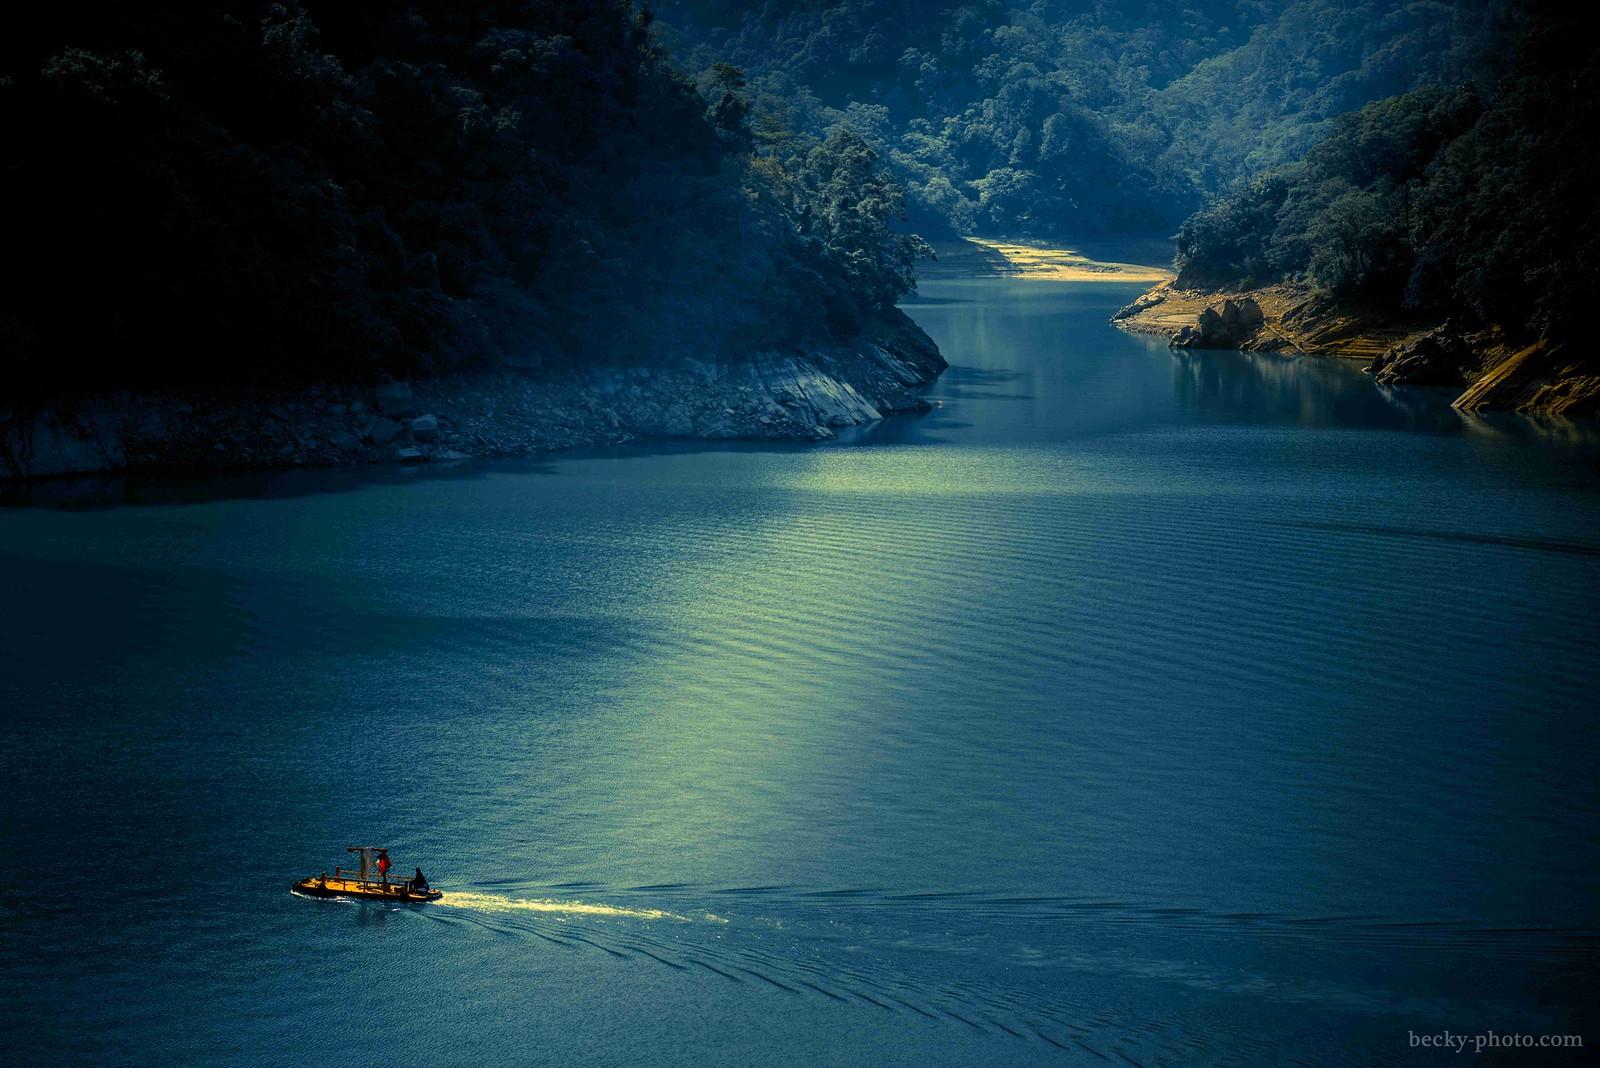 2014.Dec Shihmen Dam